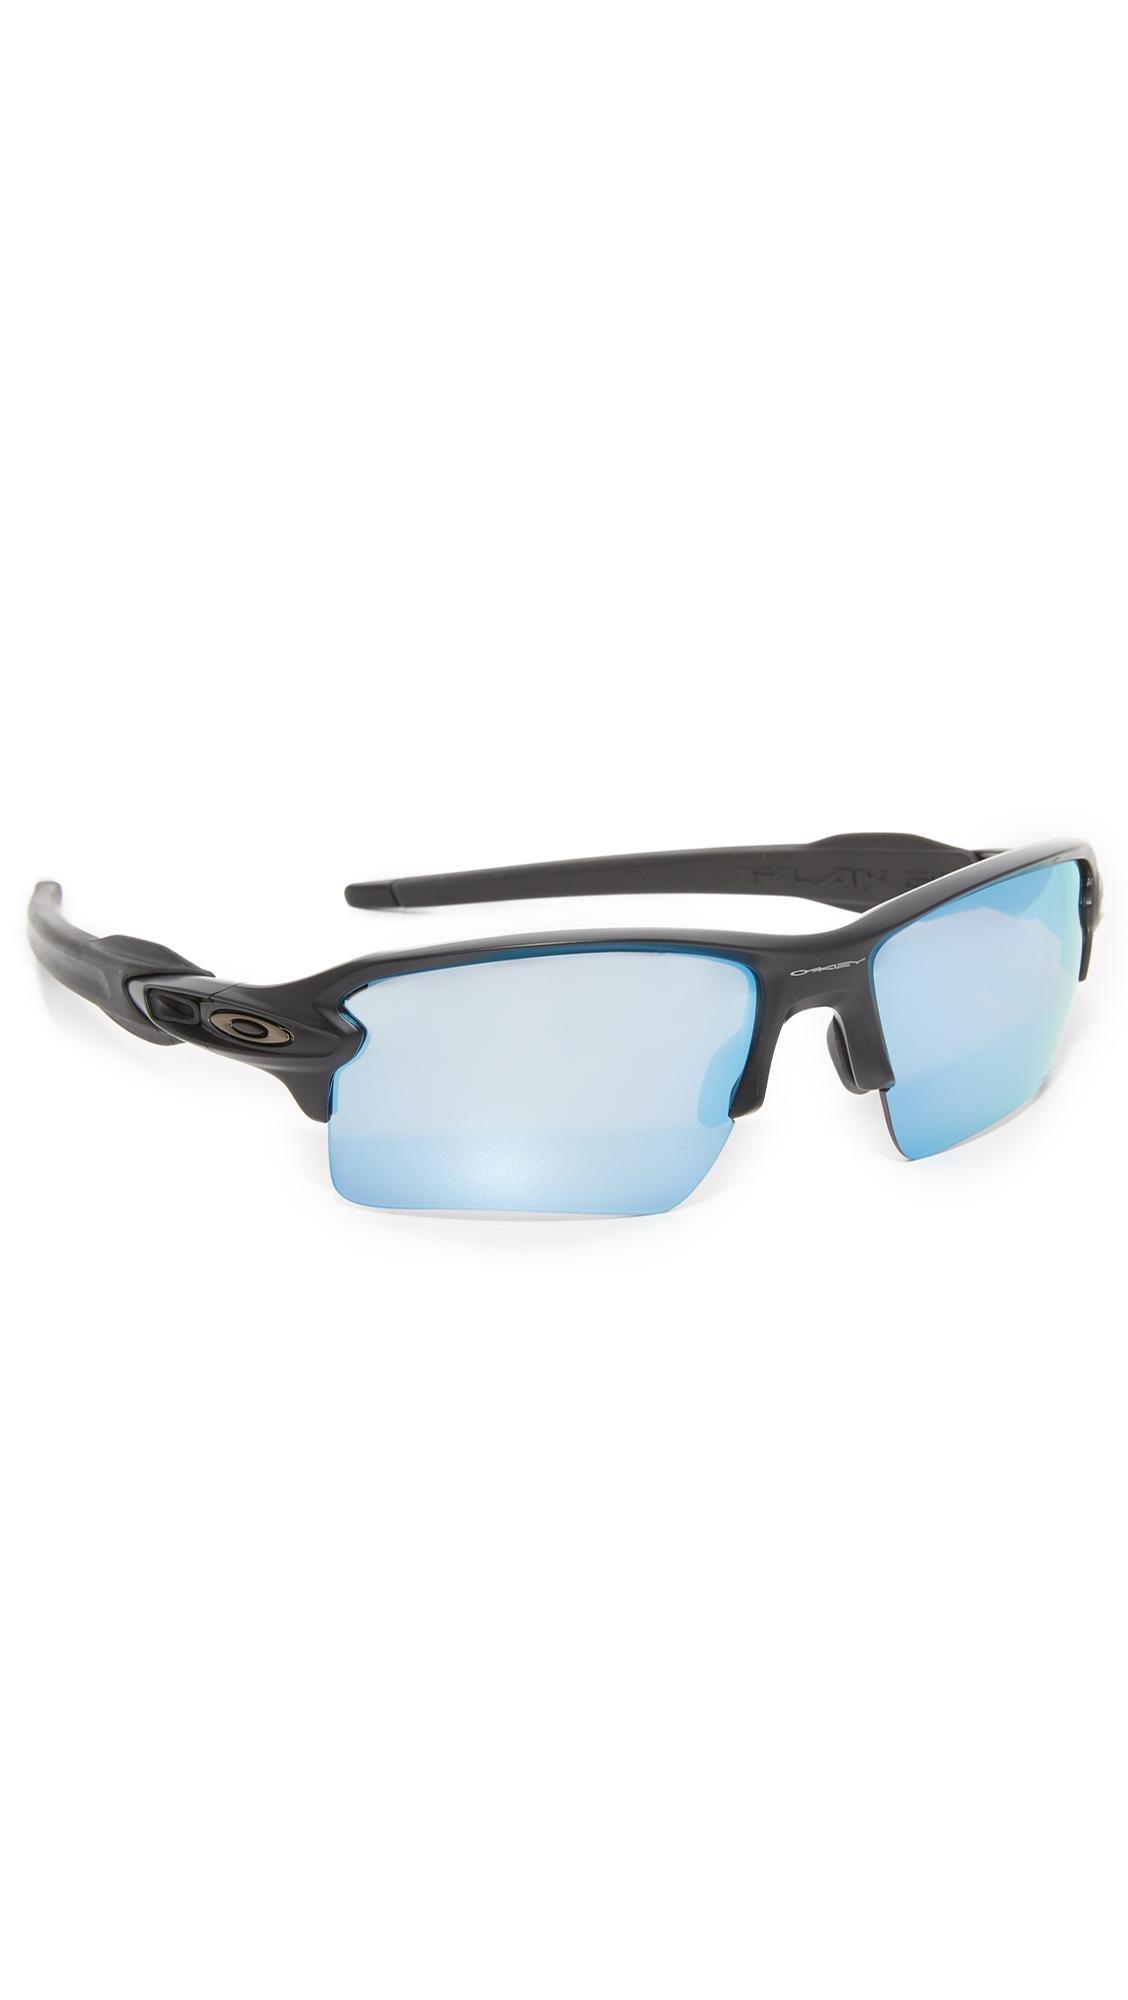 425d02b012d5 Oakley Flak 2.0 Xl Prizm Polarized Sunglasses In Black Prism Deep Water